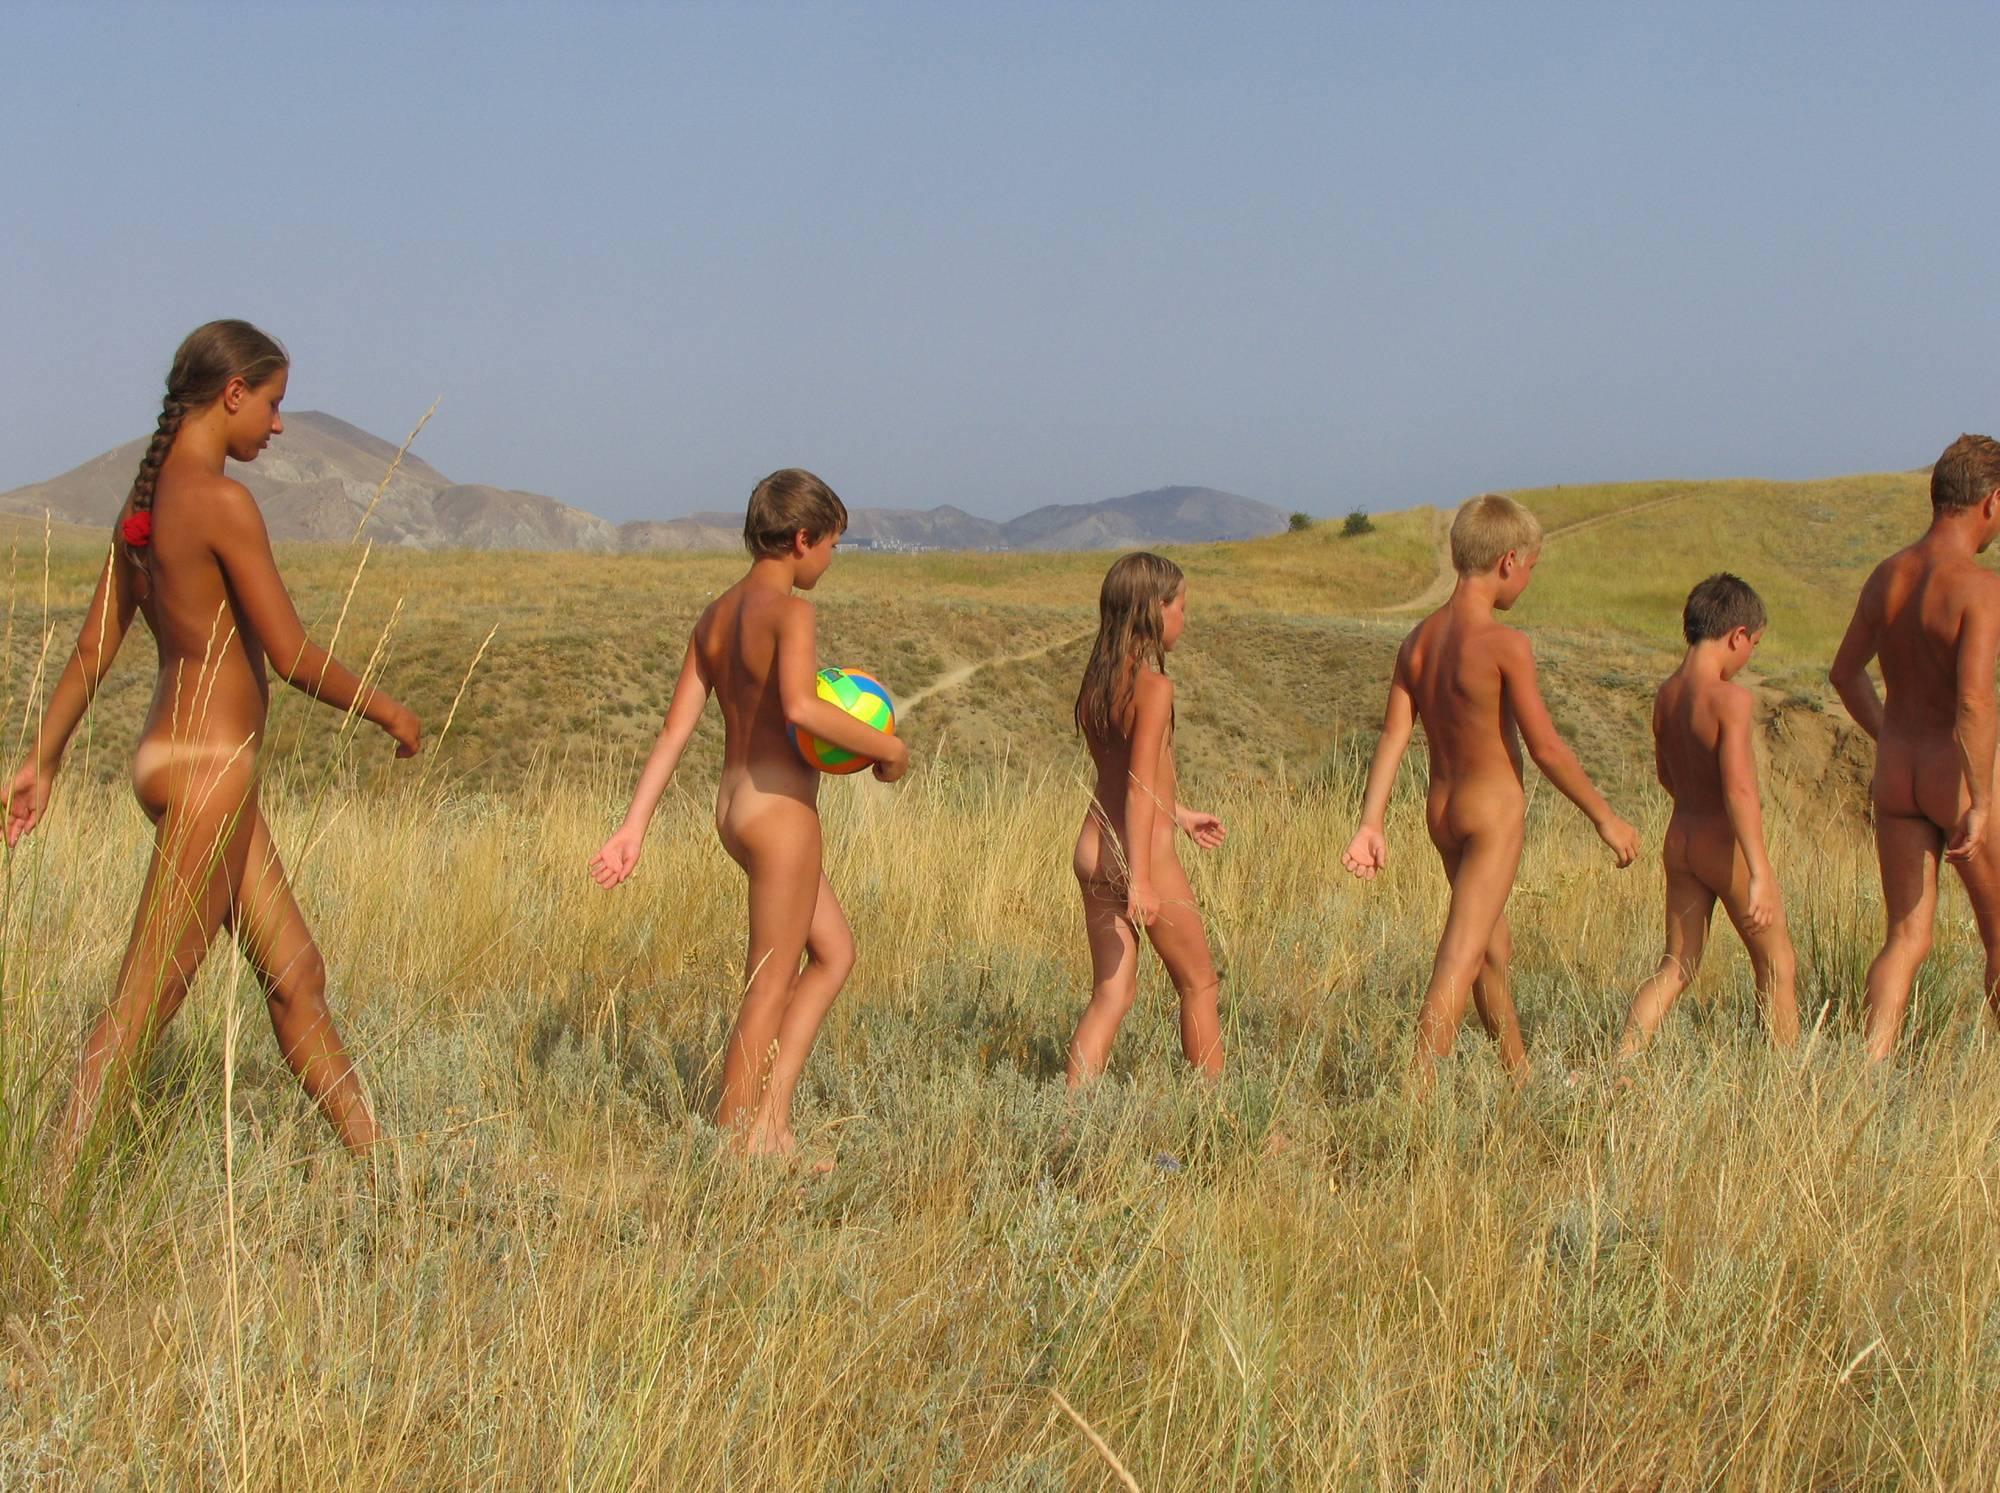 Purenudism Photos-Nude Mountain Group Hike - 2